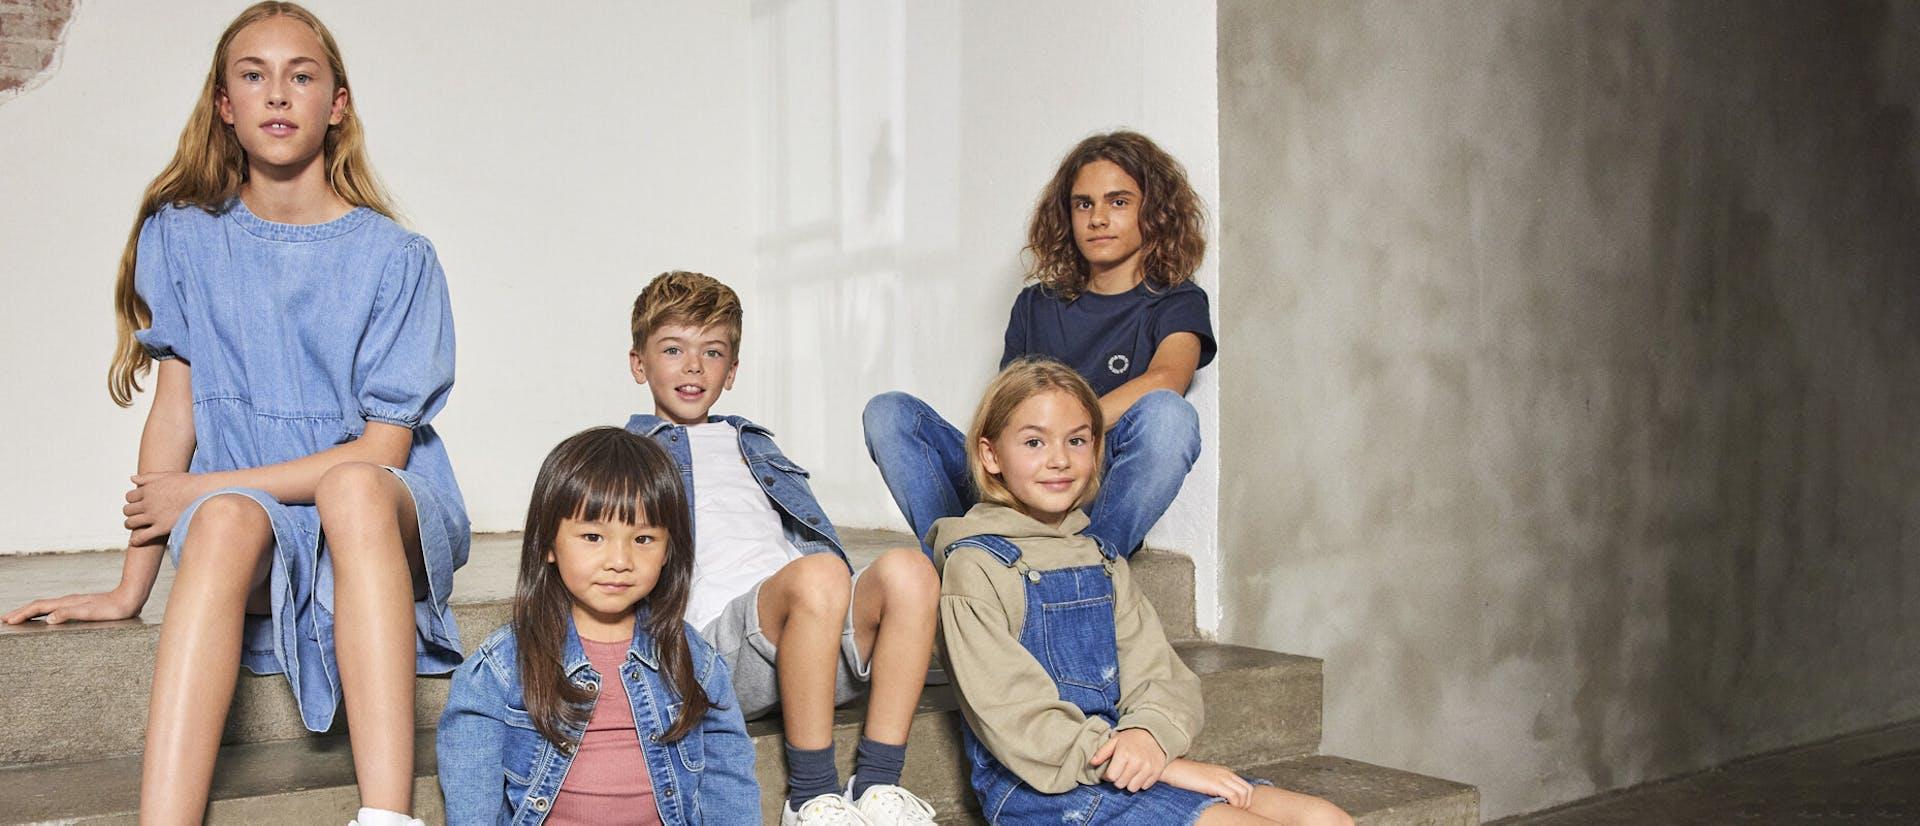 Group of children in denim